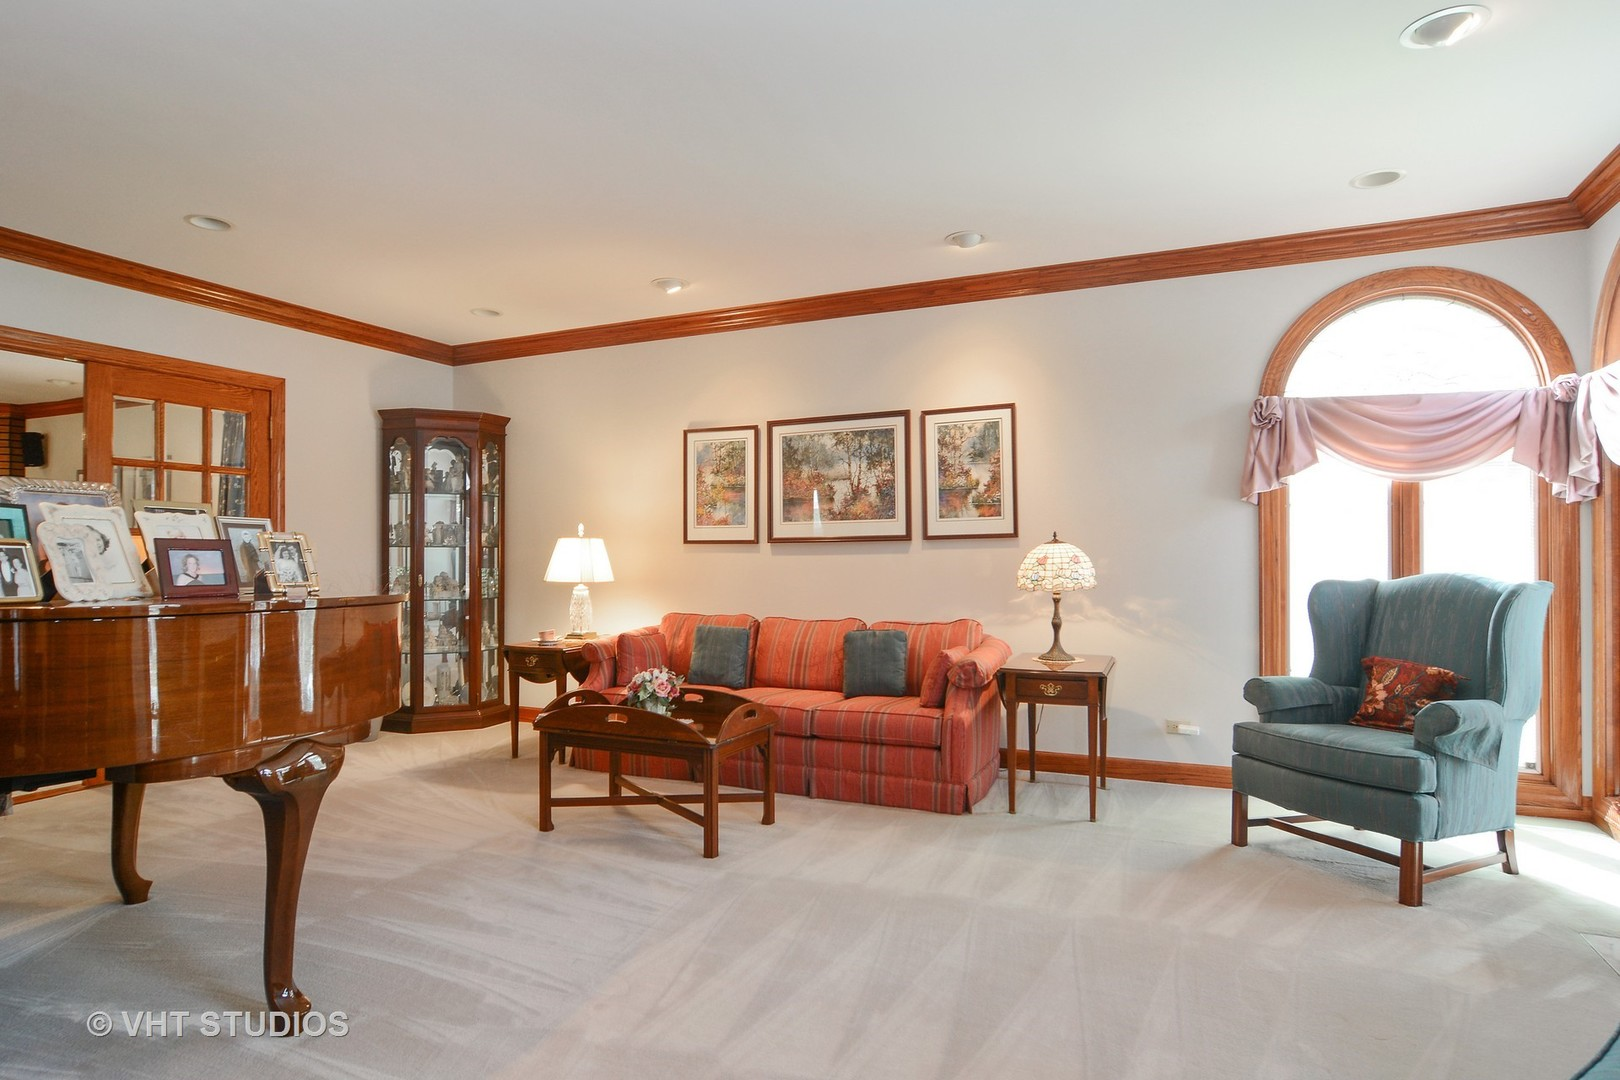 mbel rogg prospekt finest mobel rogg kuchen mabel inspiration vito sta hle und geniale stuhl. Black Bedroom Furniture Sets. Home Design Ideas